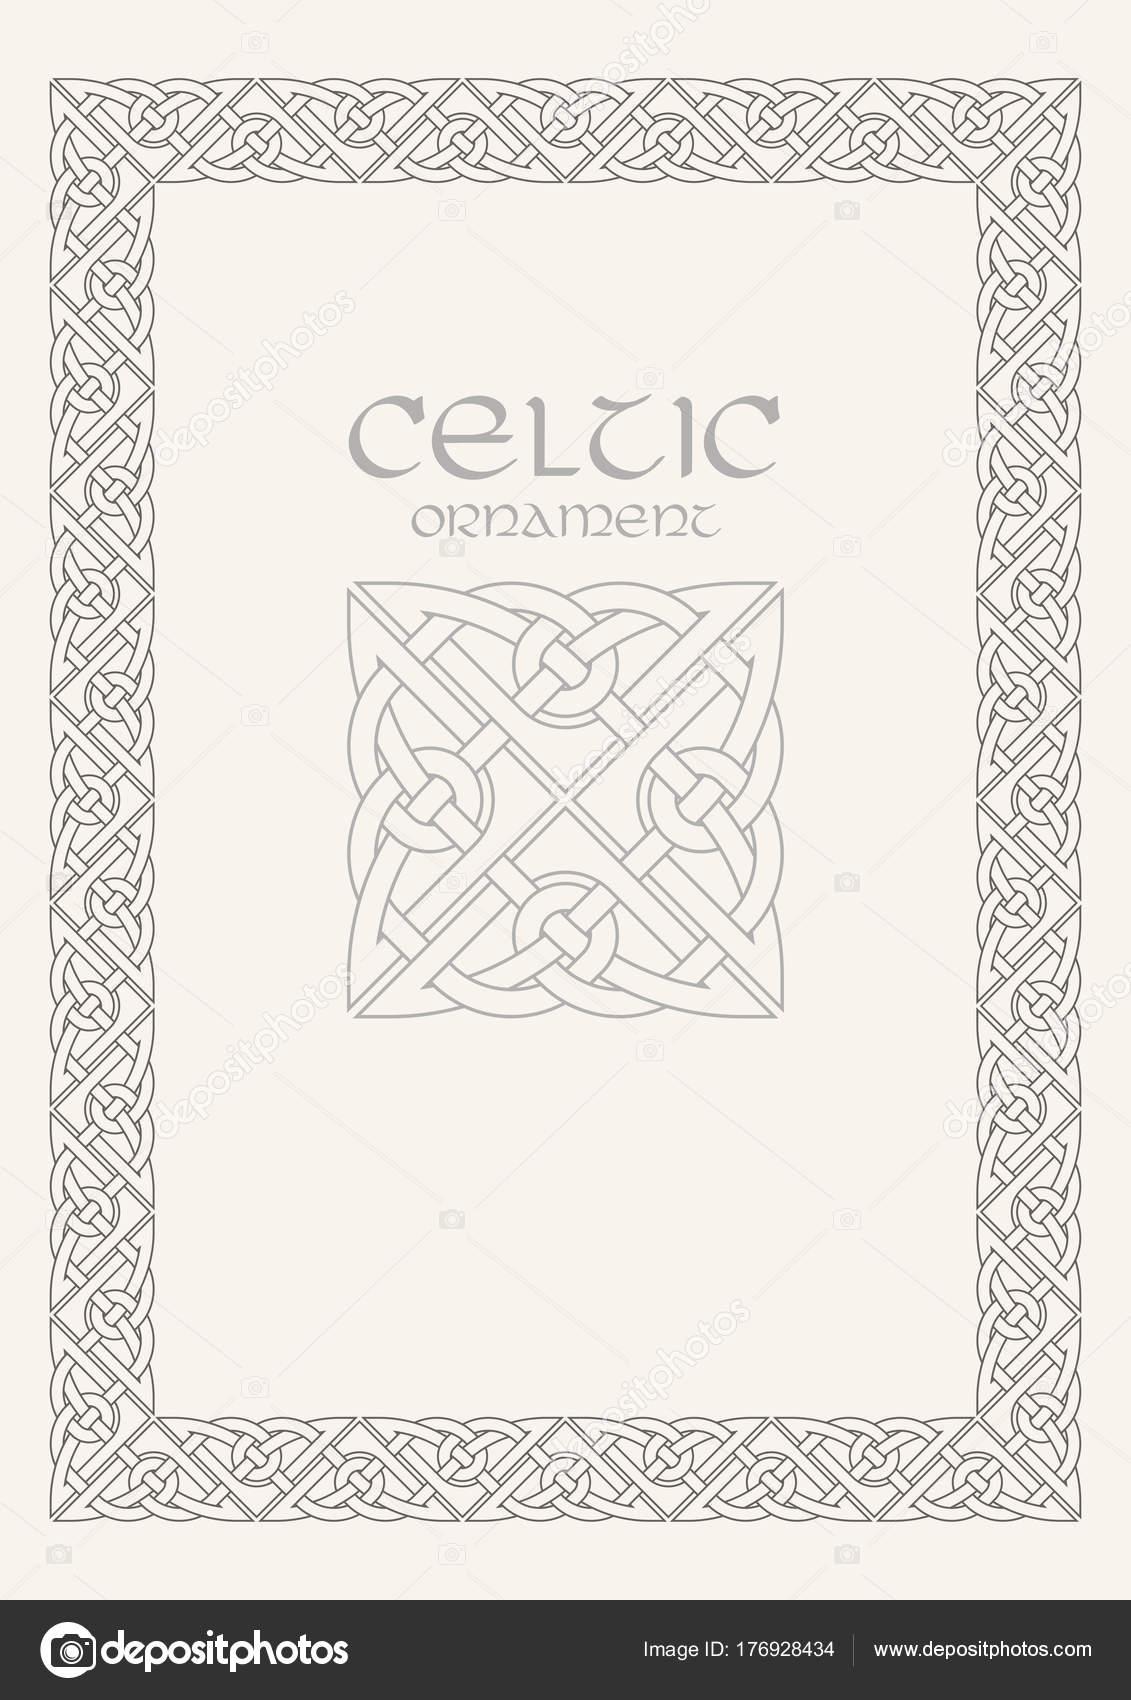 Celtic knot braided frame border ornament a4 size stock vector celtic knot braided frame border ornament a4 size stock vector yadclub Images